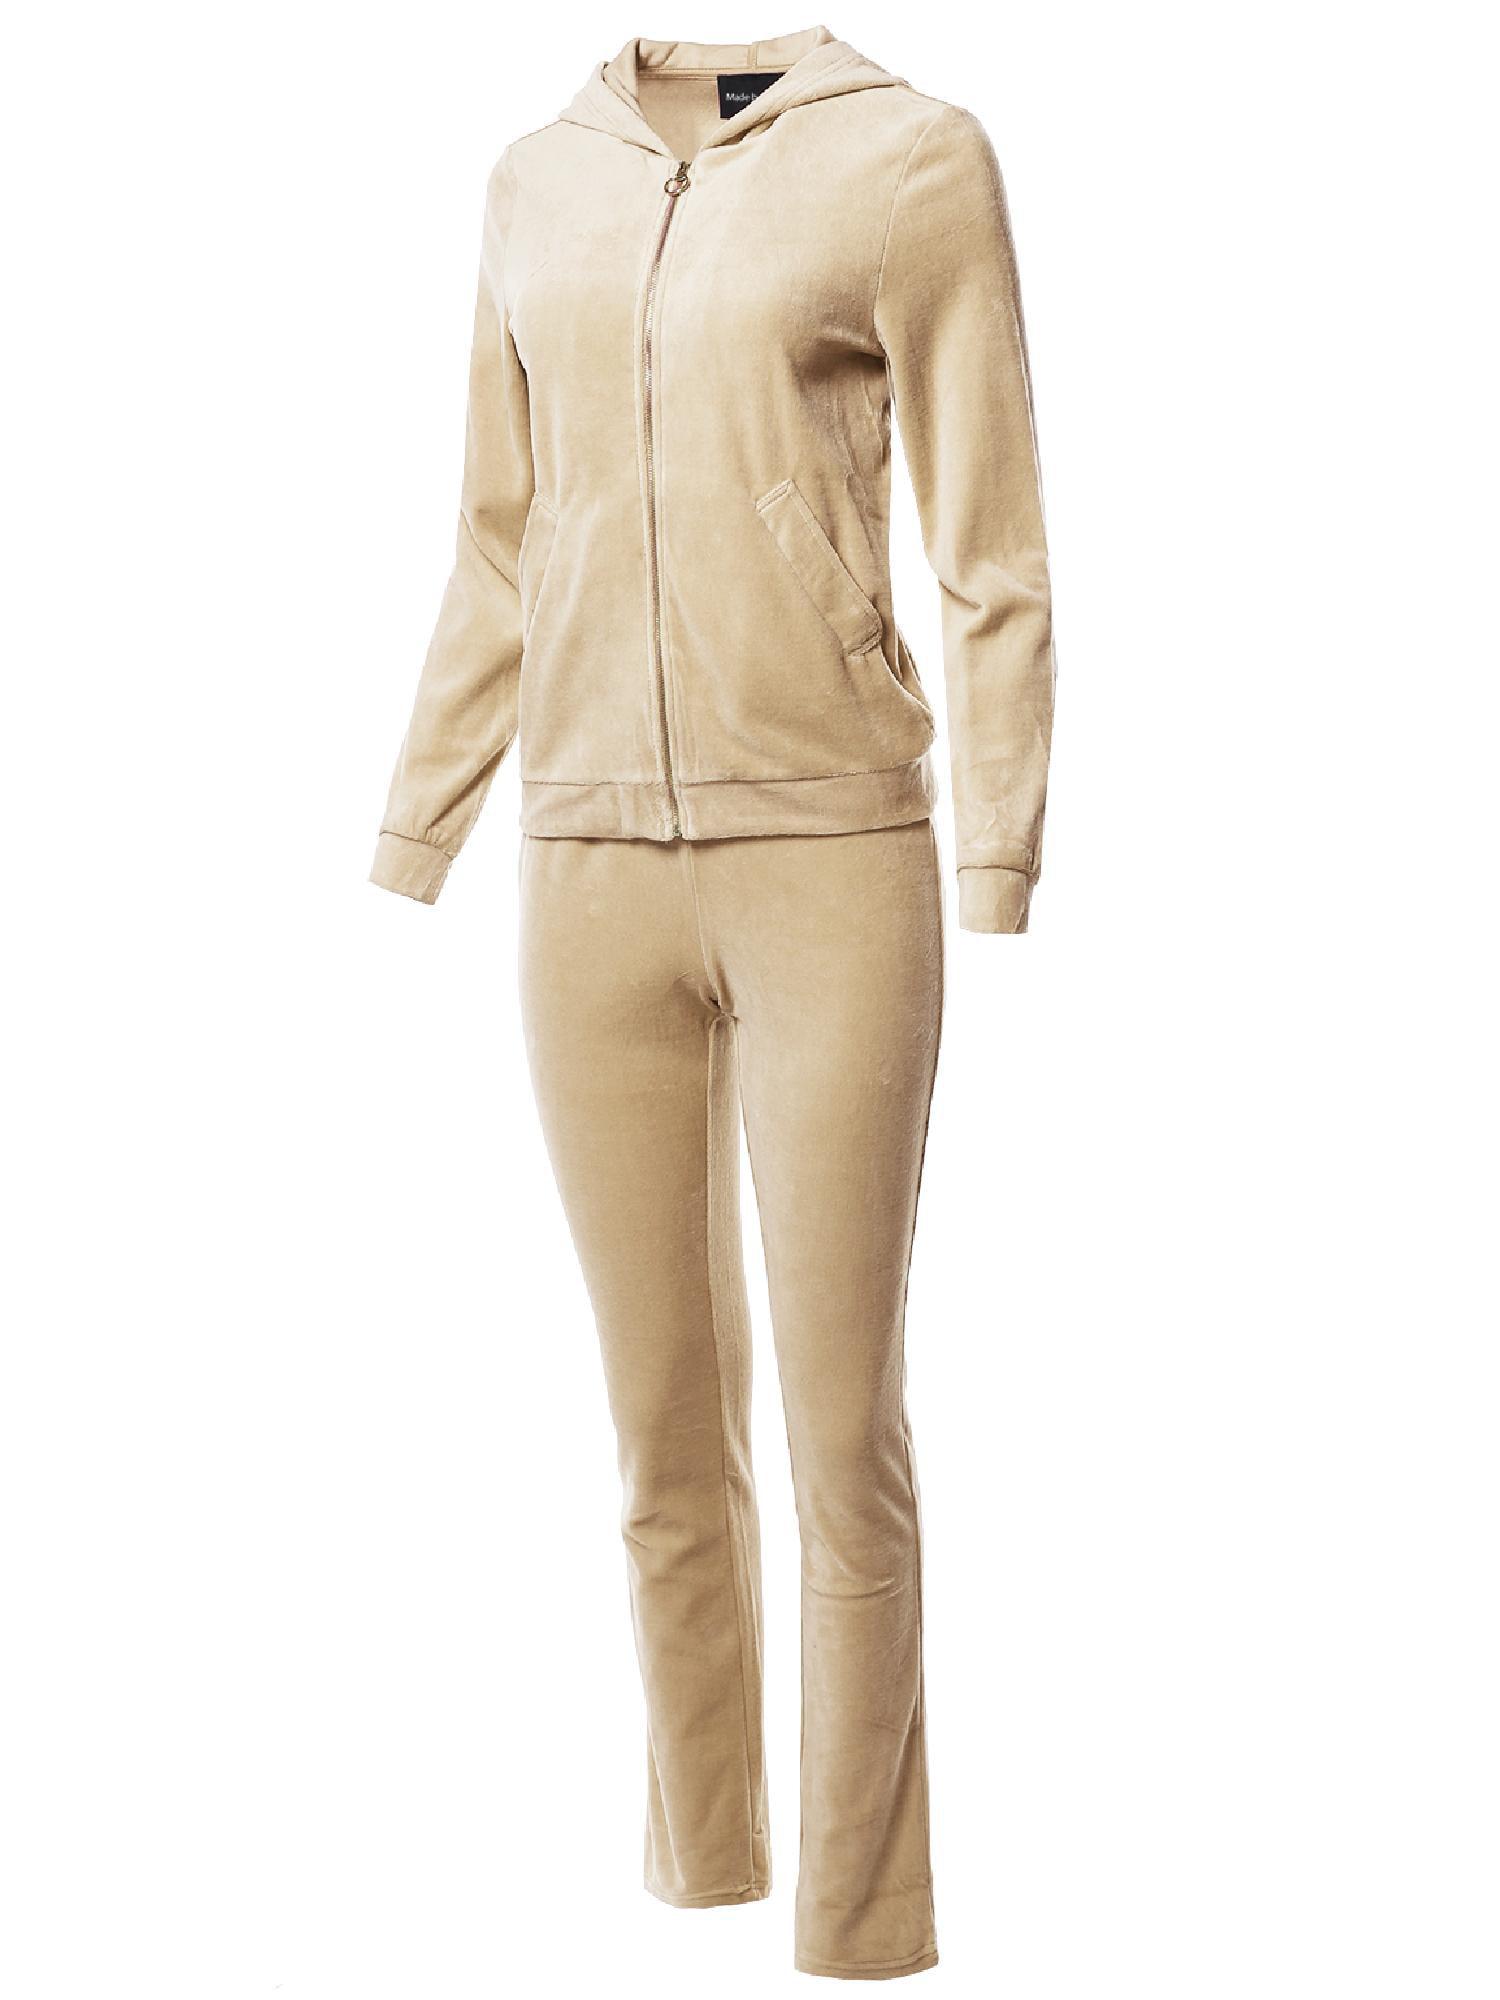 FashionOutfit Women's Solid Soft Velvet Zip-Up Hoodie Workout Sweatpants Set